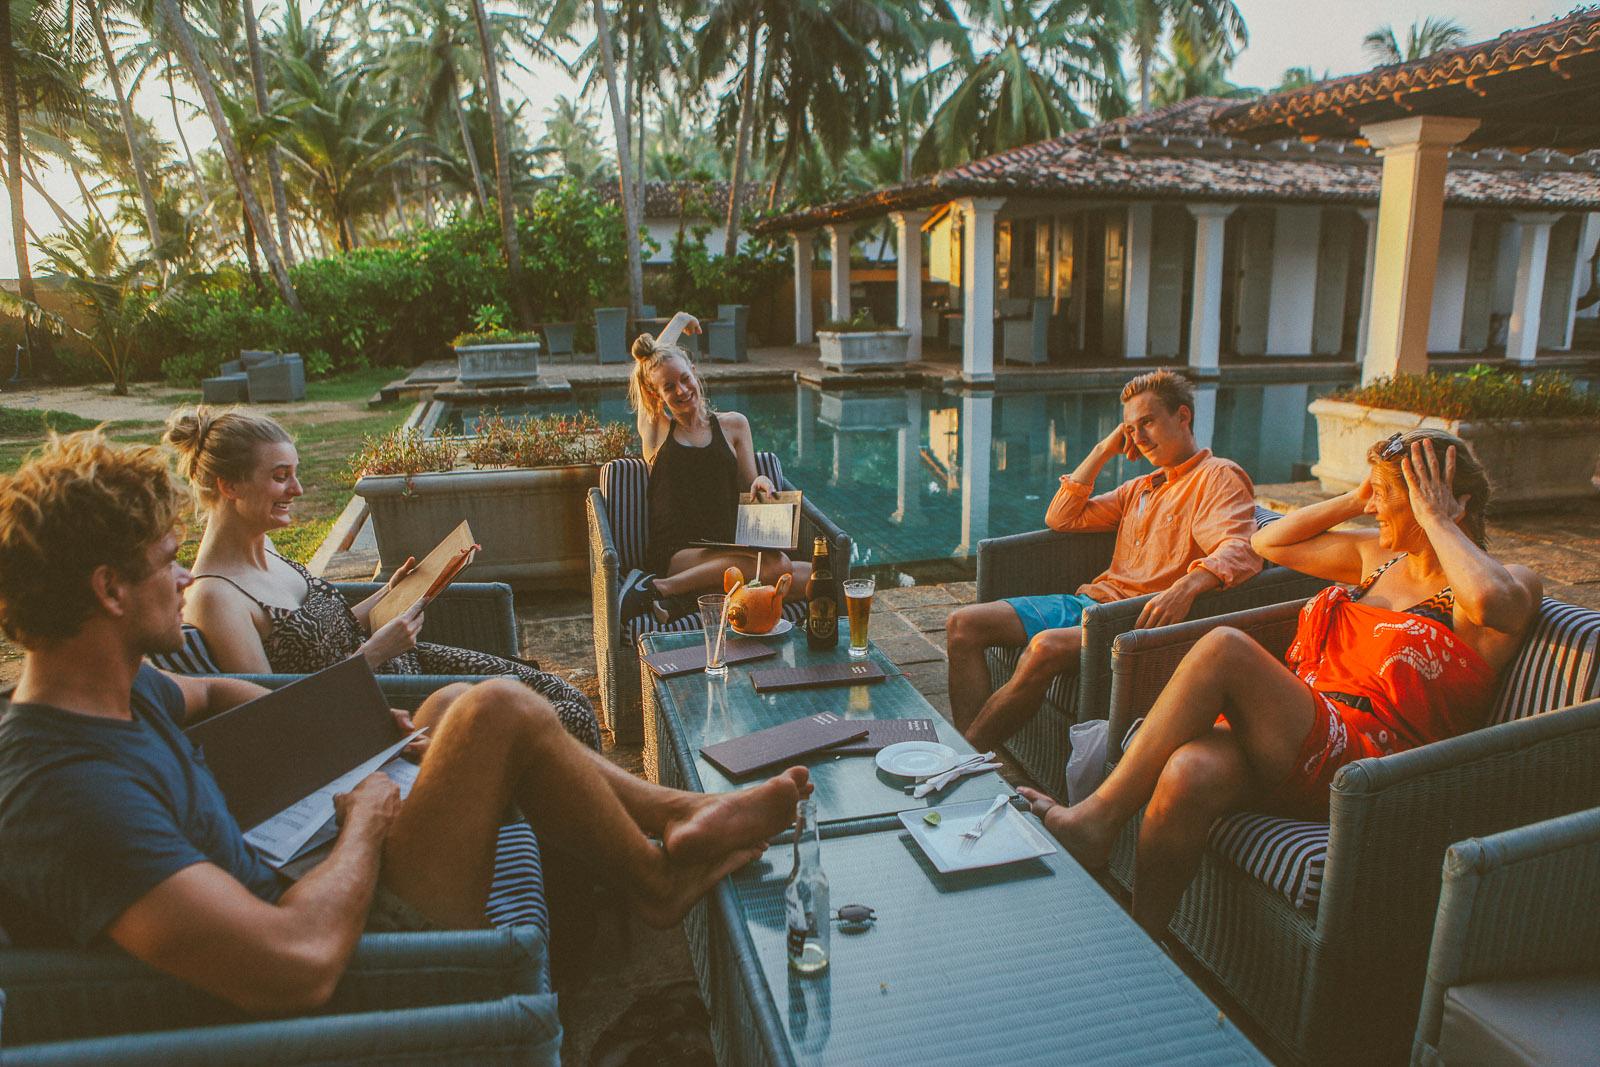 Sri Lanka-Hikkaduwa-Midigama-thalpe-era-beach-jetwing-surf-travel-blog-IMG_8683